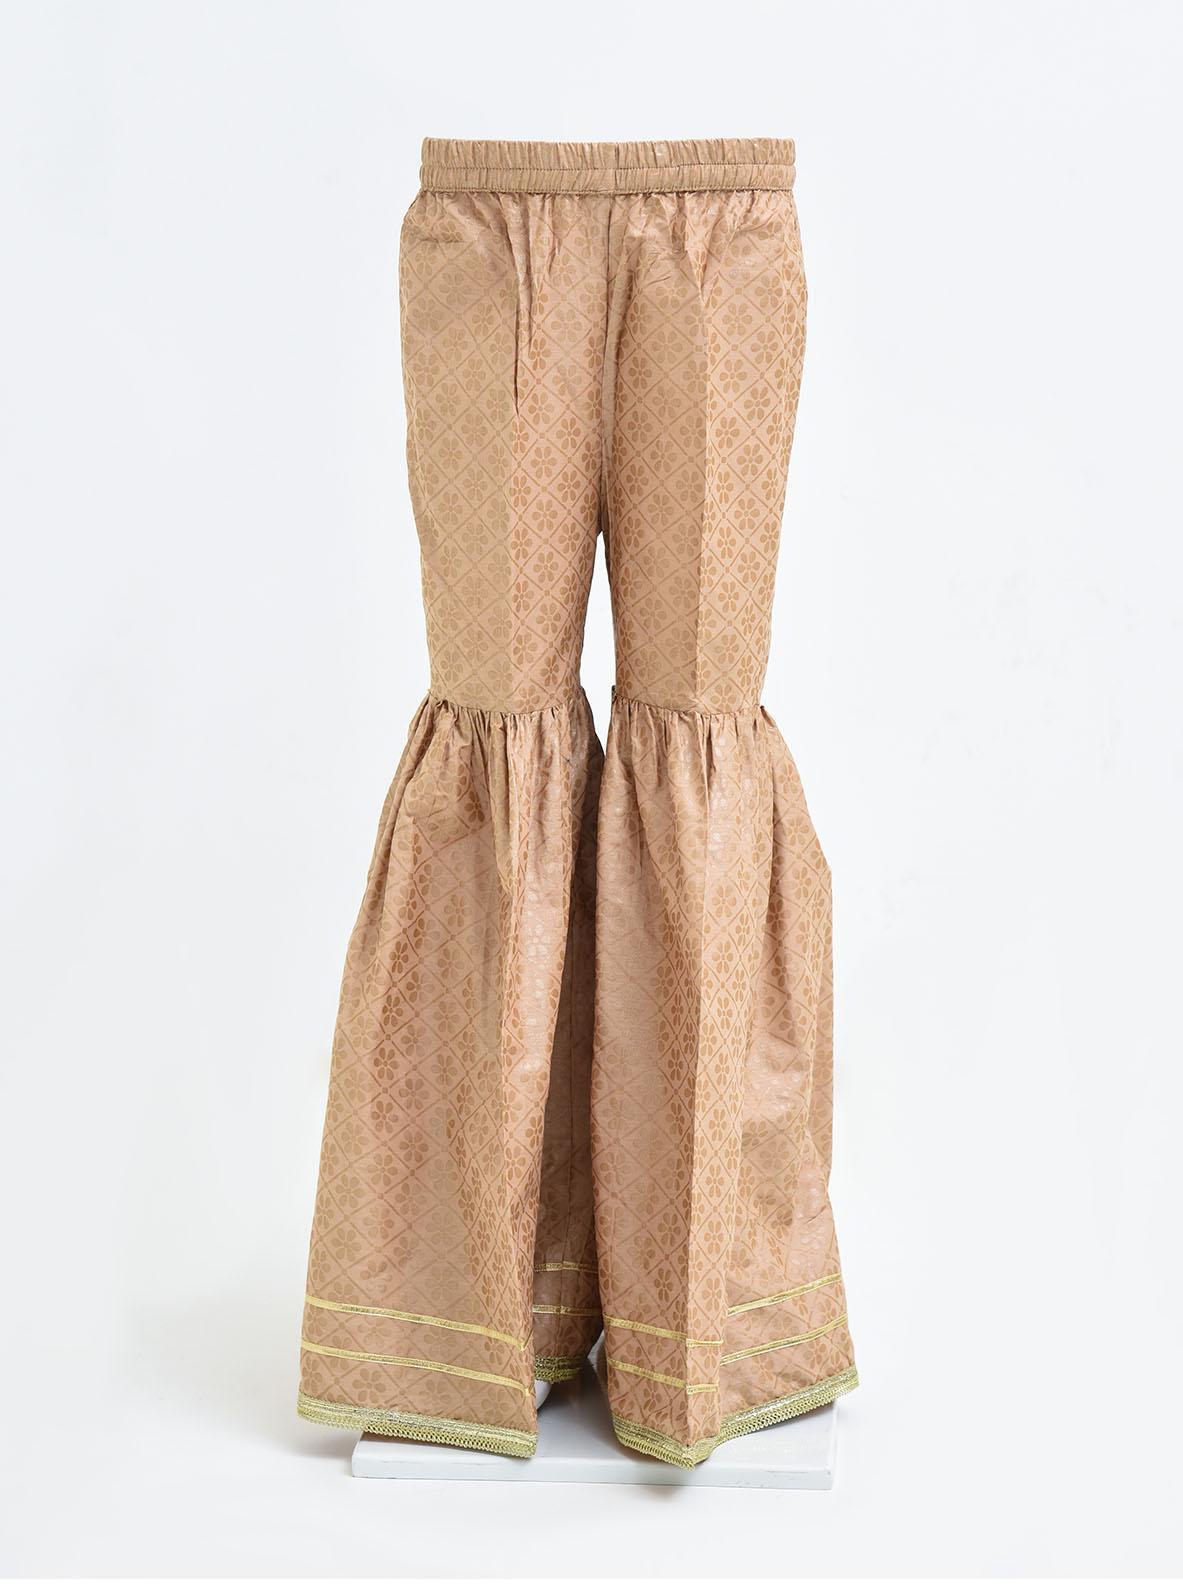 Ochre Cotton Printed Girls Gharara -  OGP 08 Beige